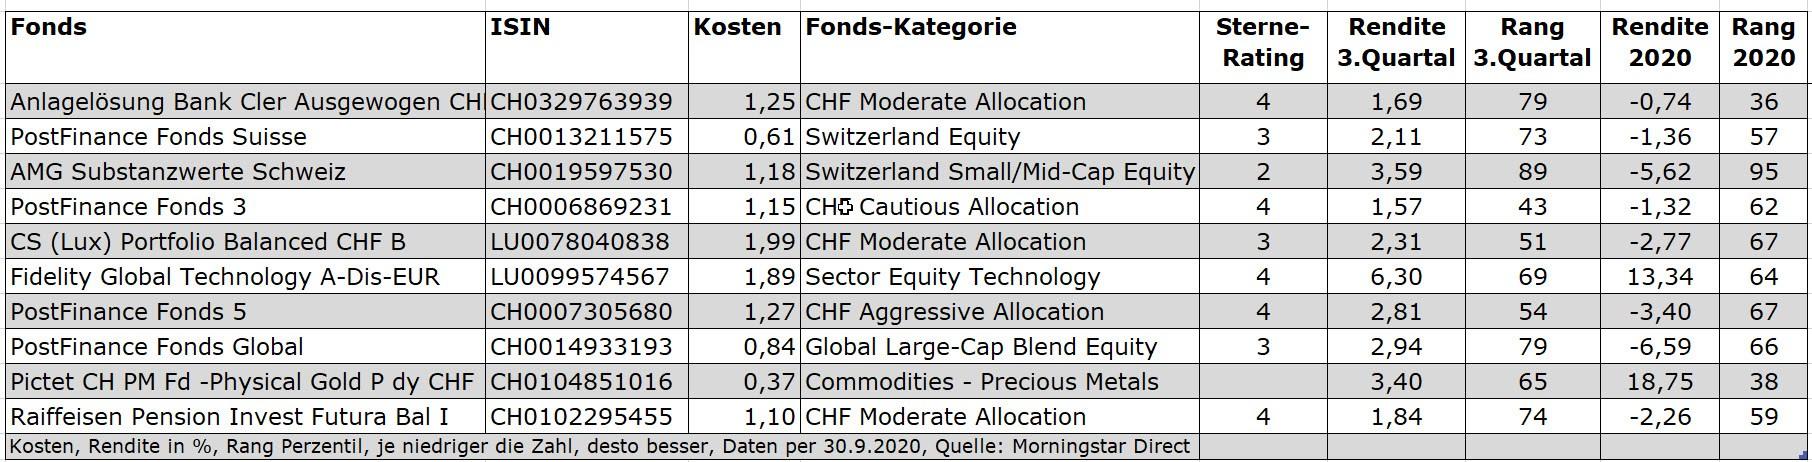 Ch funds q3 less columns